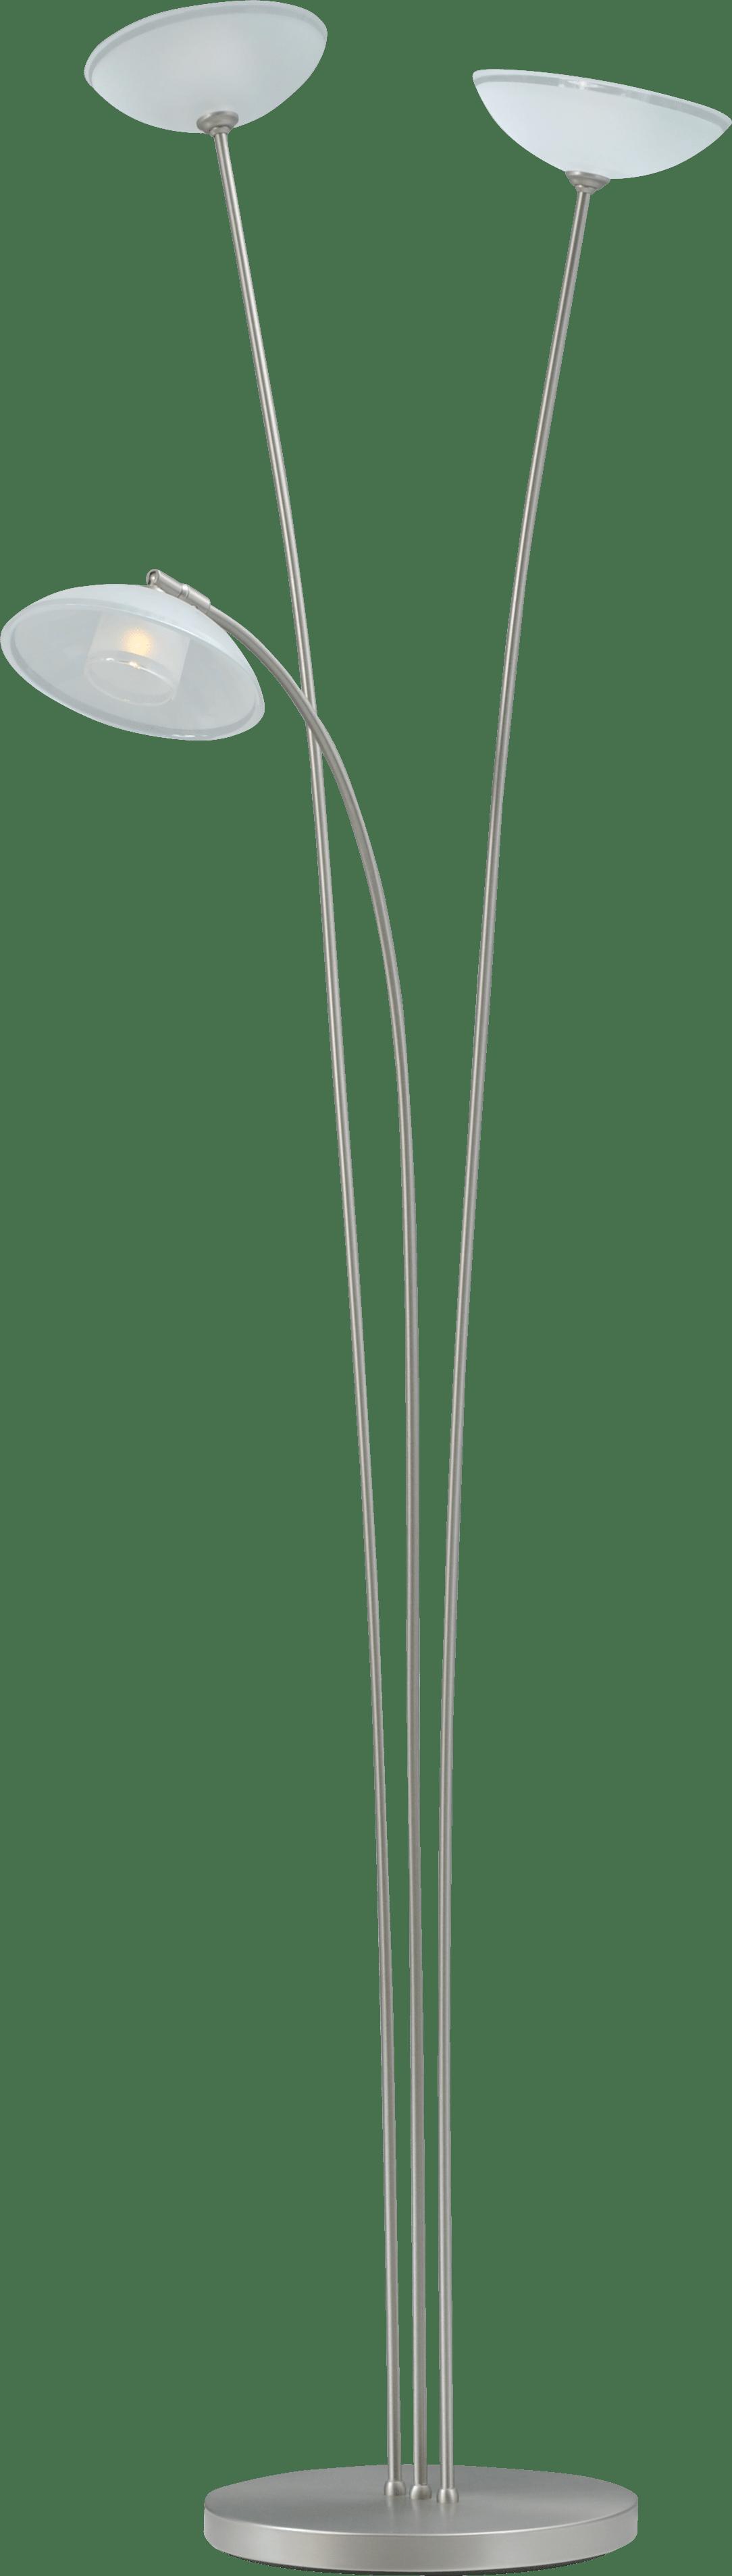 Melani VL MELANI NICKEL 3LT H.180CM INCL.PUSH